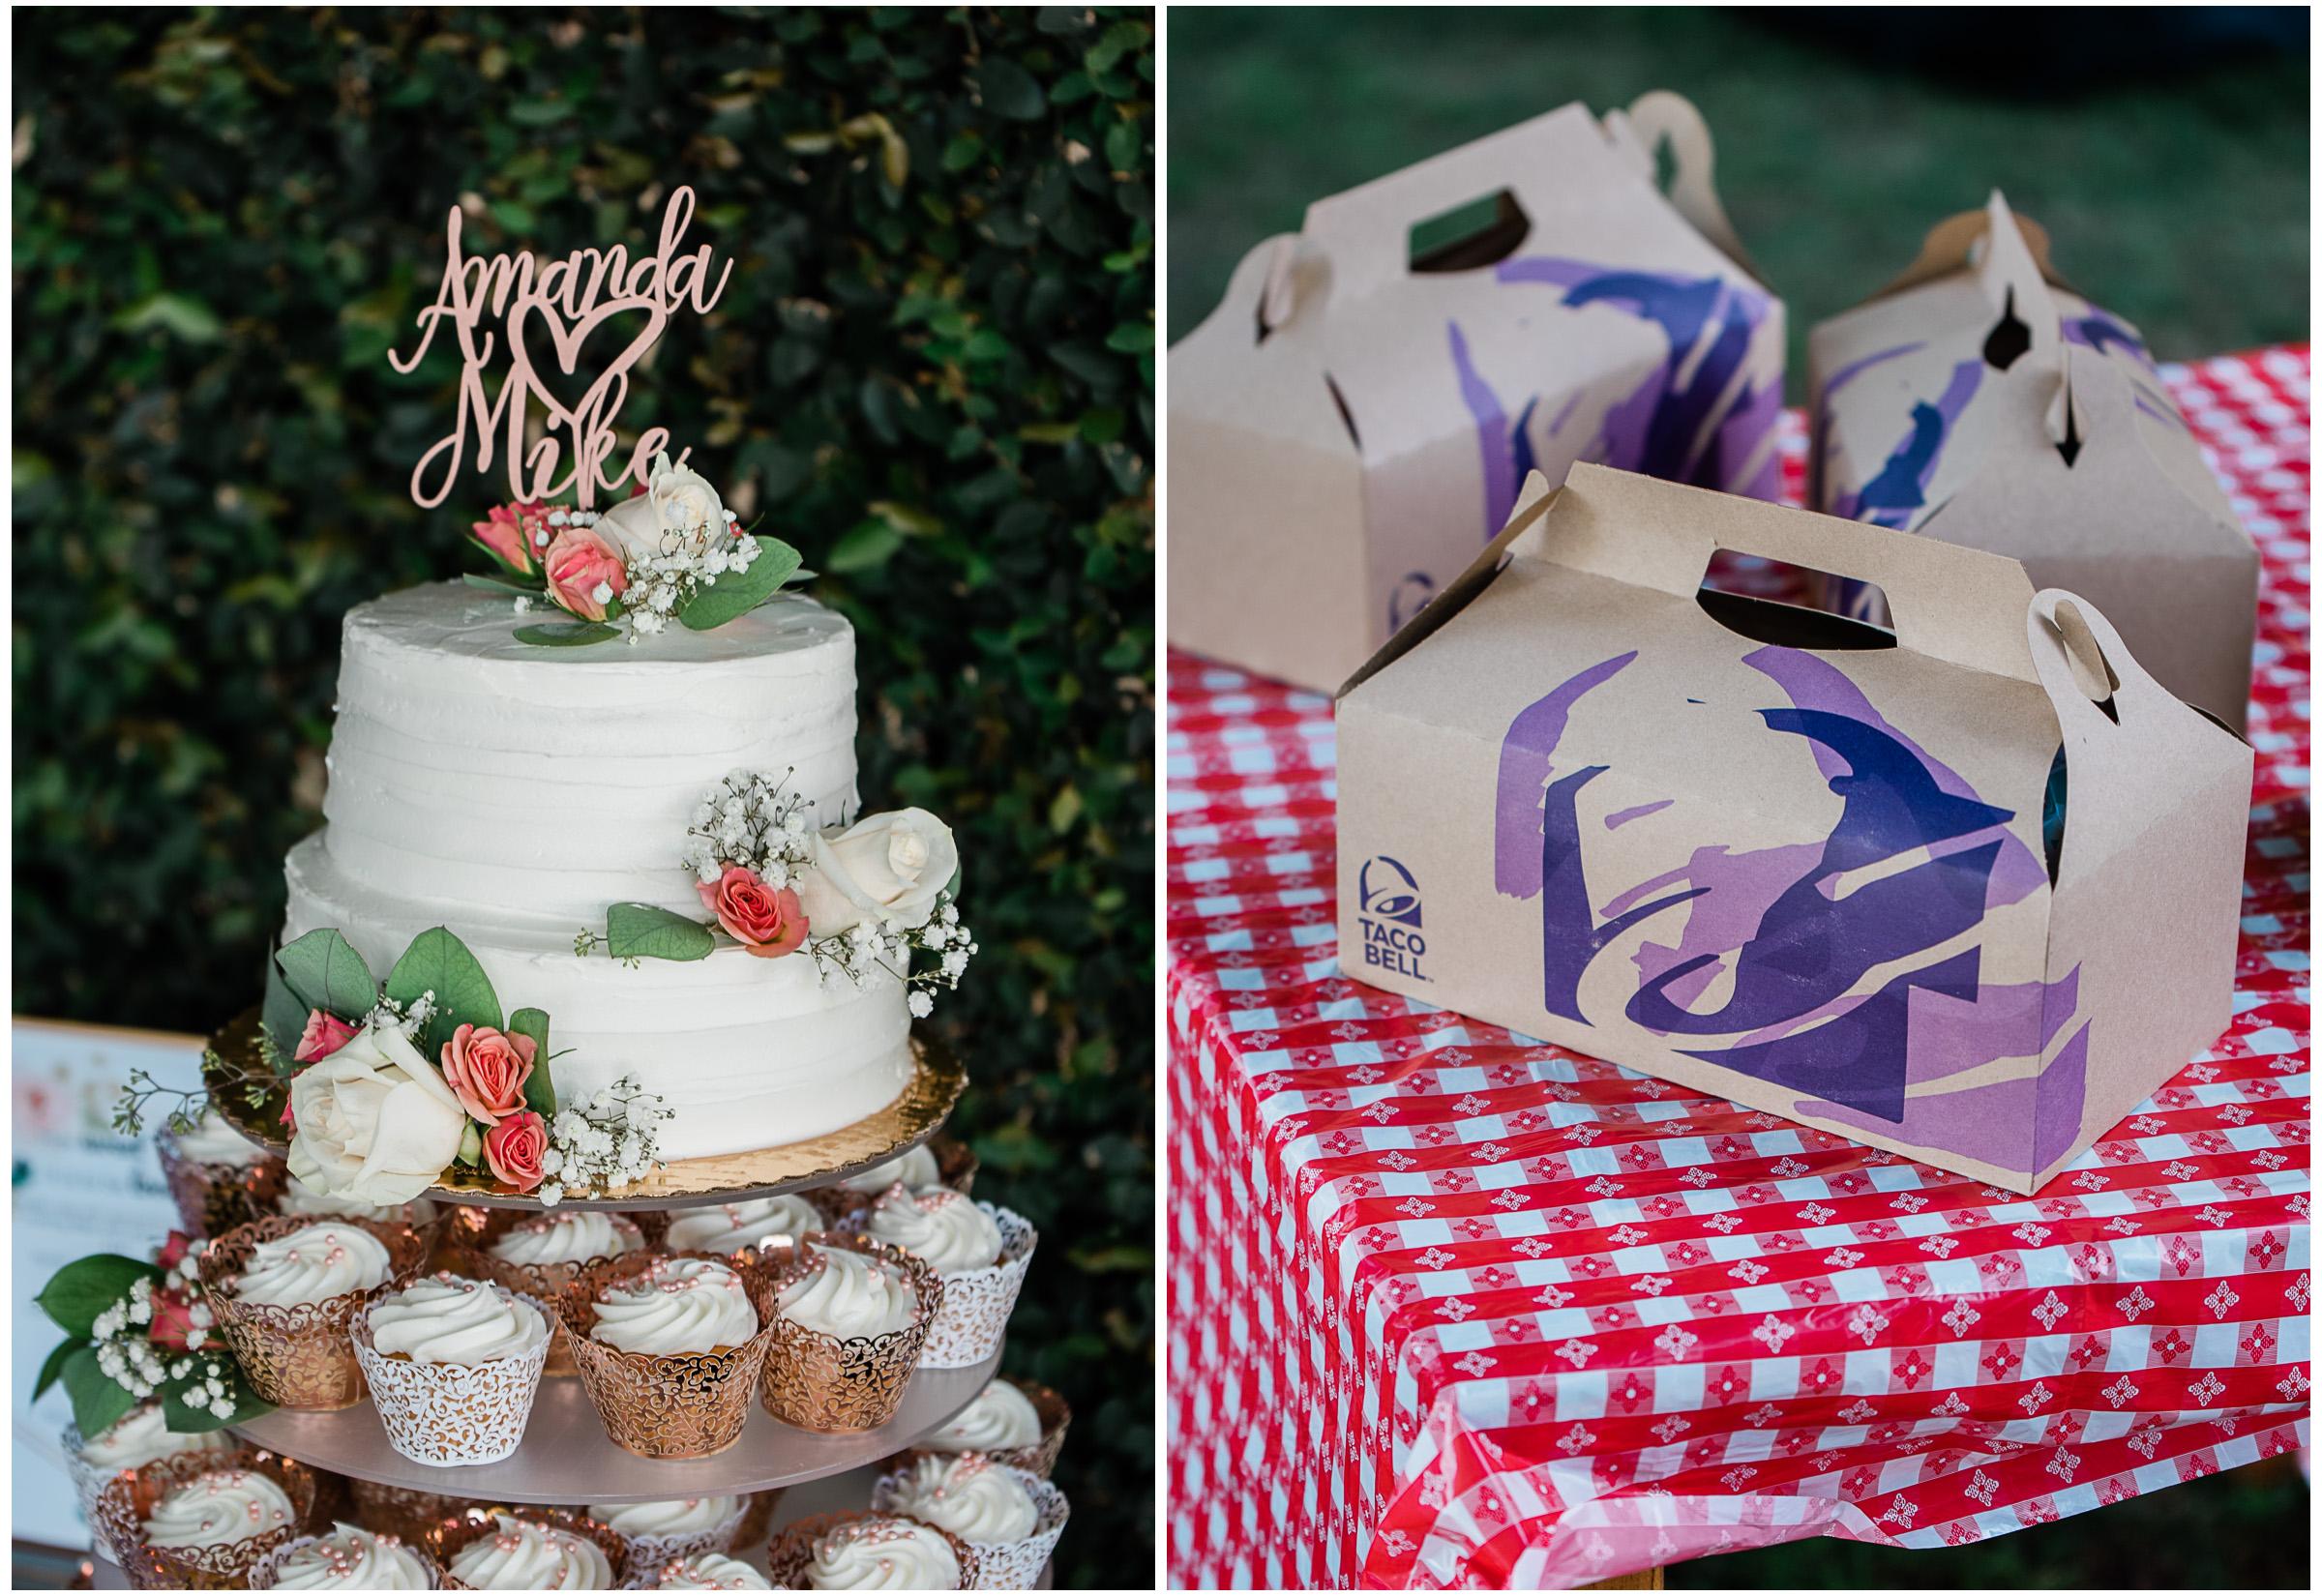 Clarksburg Wedding - Sacramento Photographer - Bogle Winery - Justin Wilcox Photography - 17.jpg